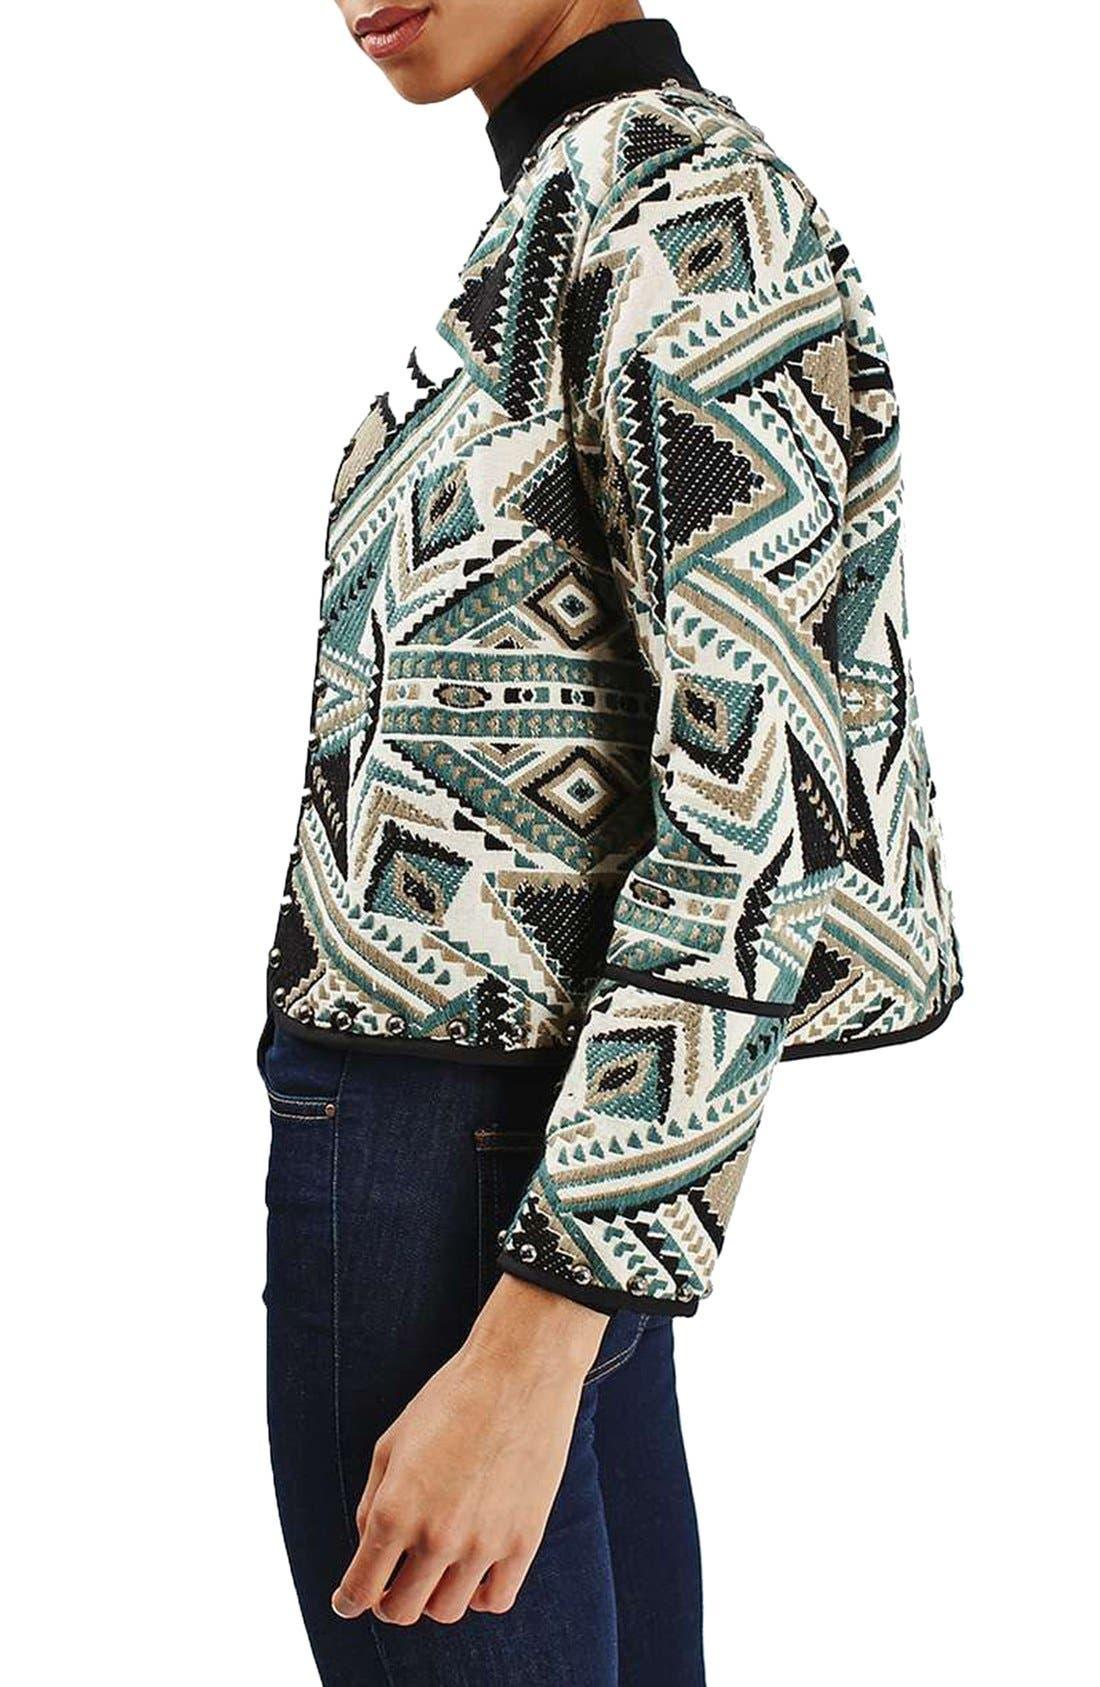 Main Image - Topshop Studded Embroidered Jacket